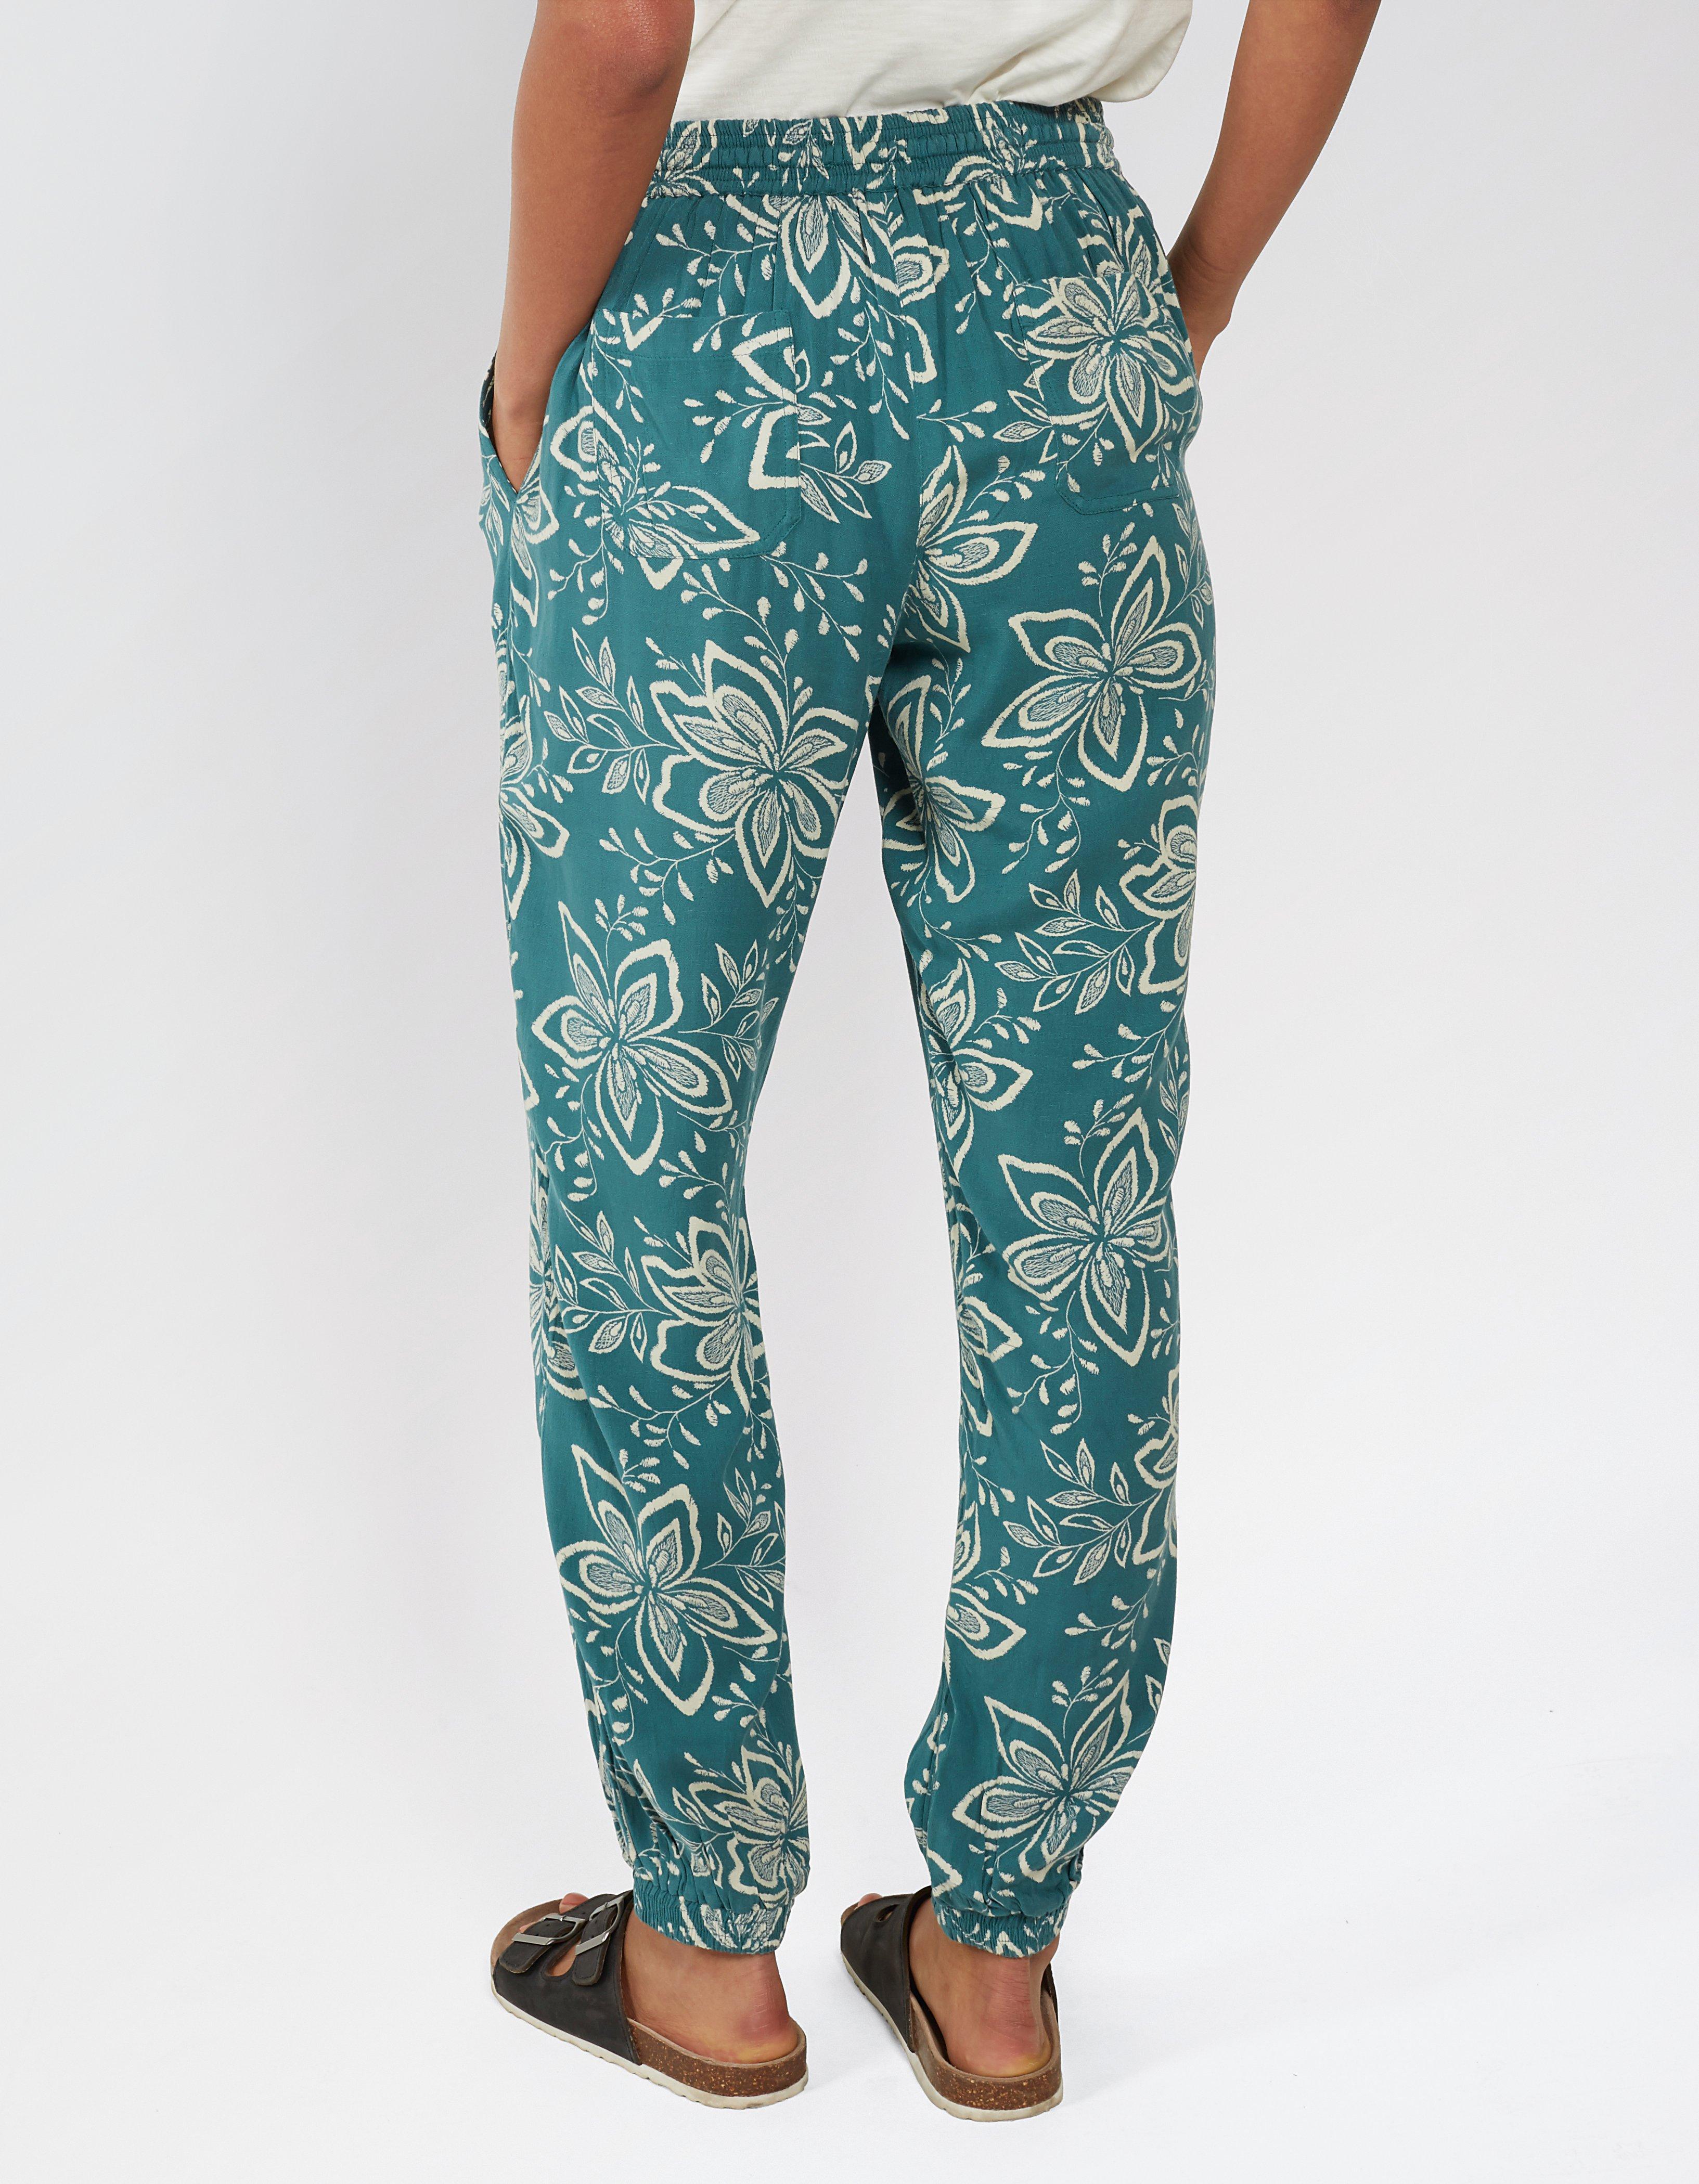 Star Flower Cuffed Pants